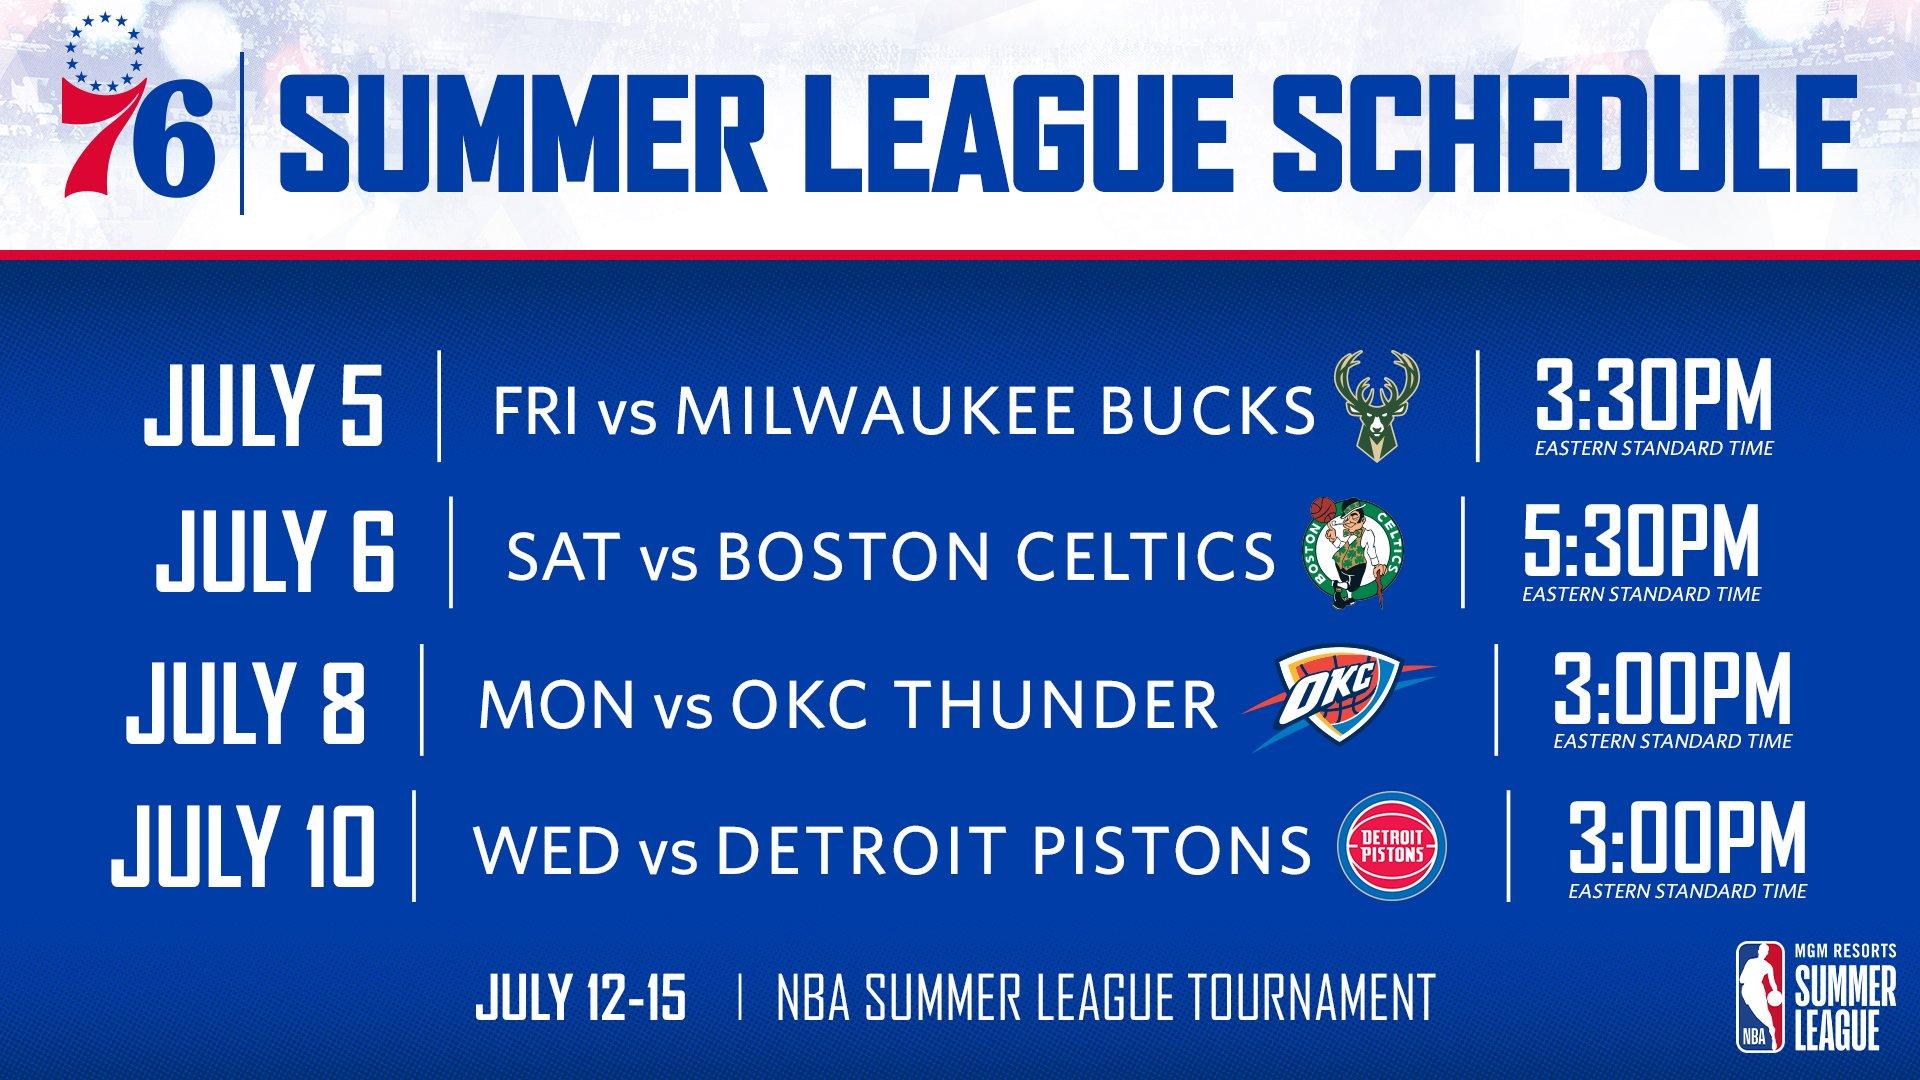 Nba Announces Schedule For 2019 Summer League | Philadelphia 76Ers 76Ers Calendar 2019